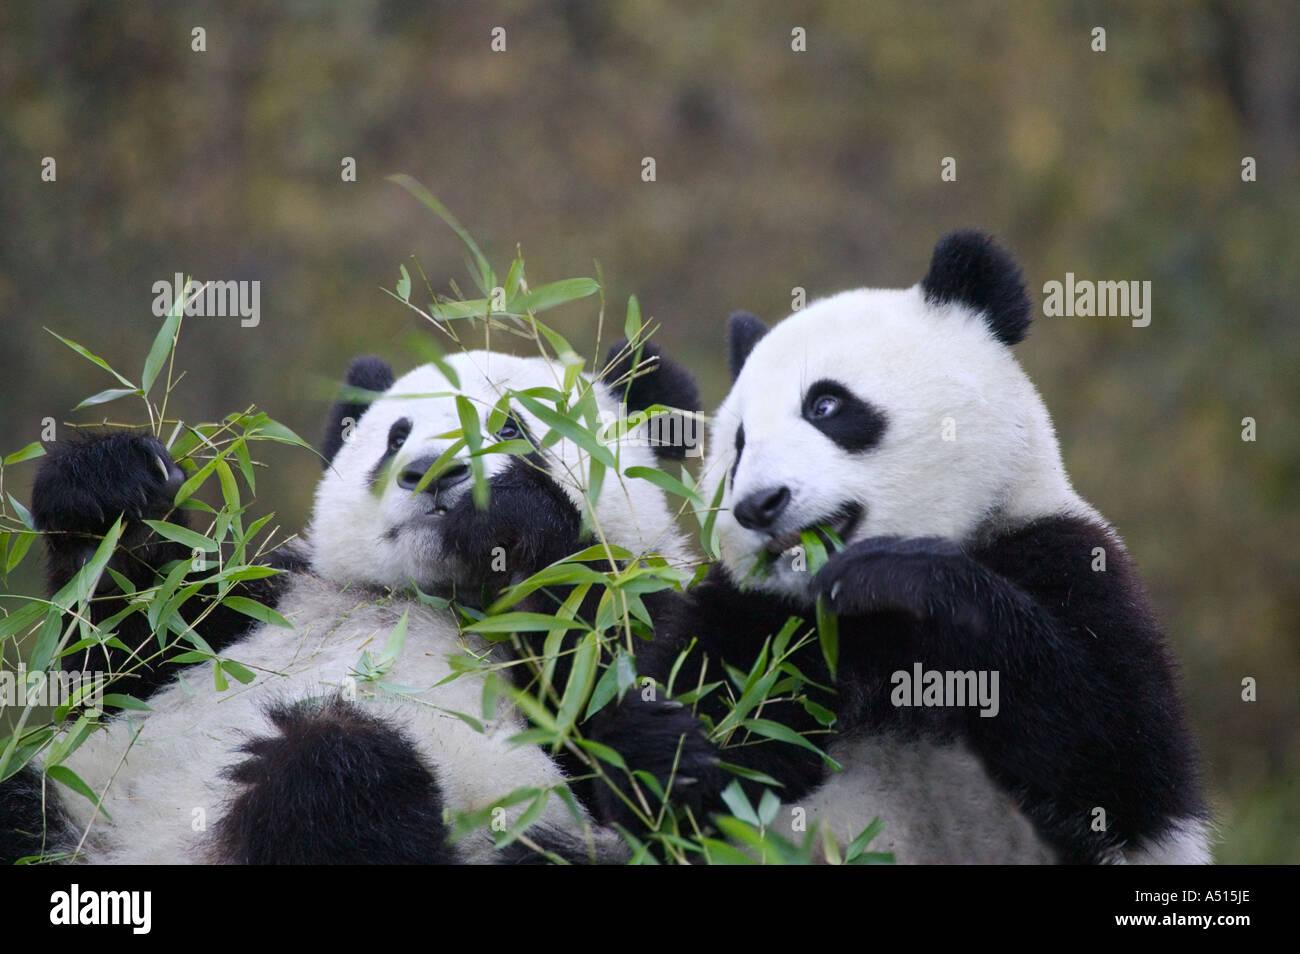 Zwei Panda Jungen Bambus Wolong Sichuan China Essen Stockfoto Bild